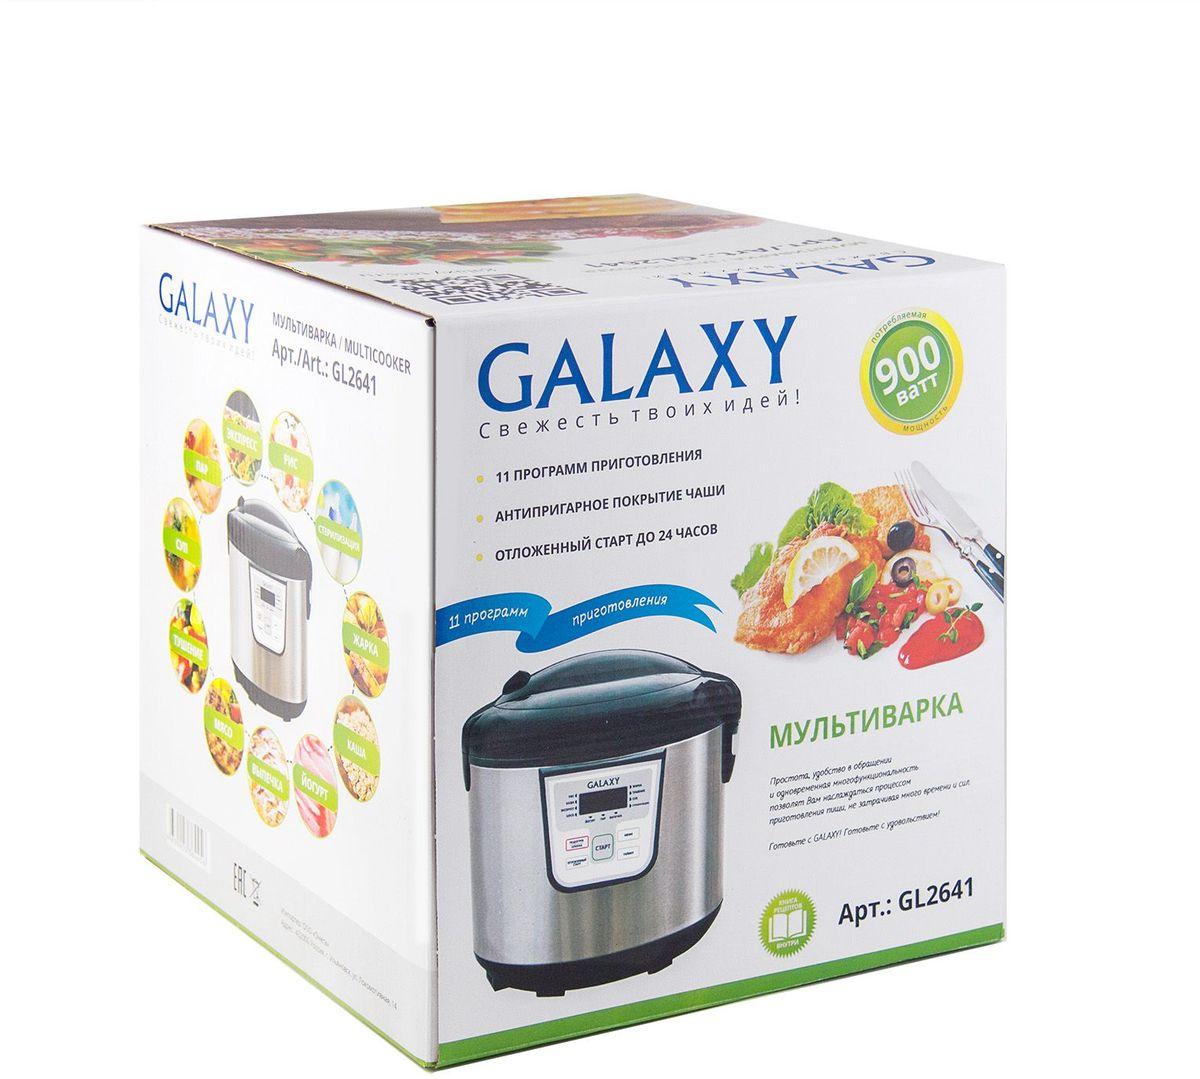 Мультиварка Galaxy GL 2641, Black Galaxy